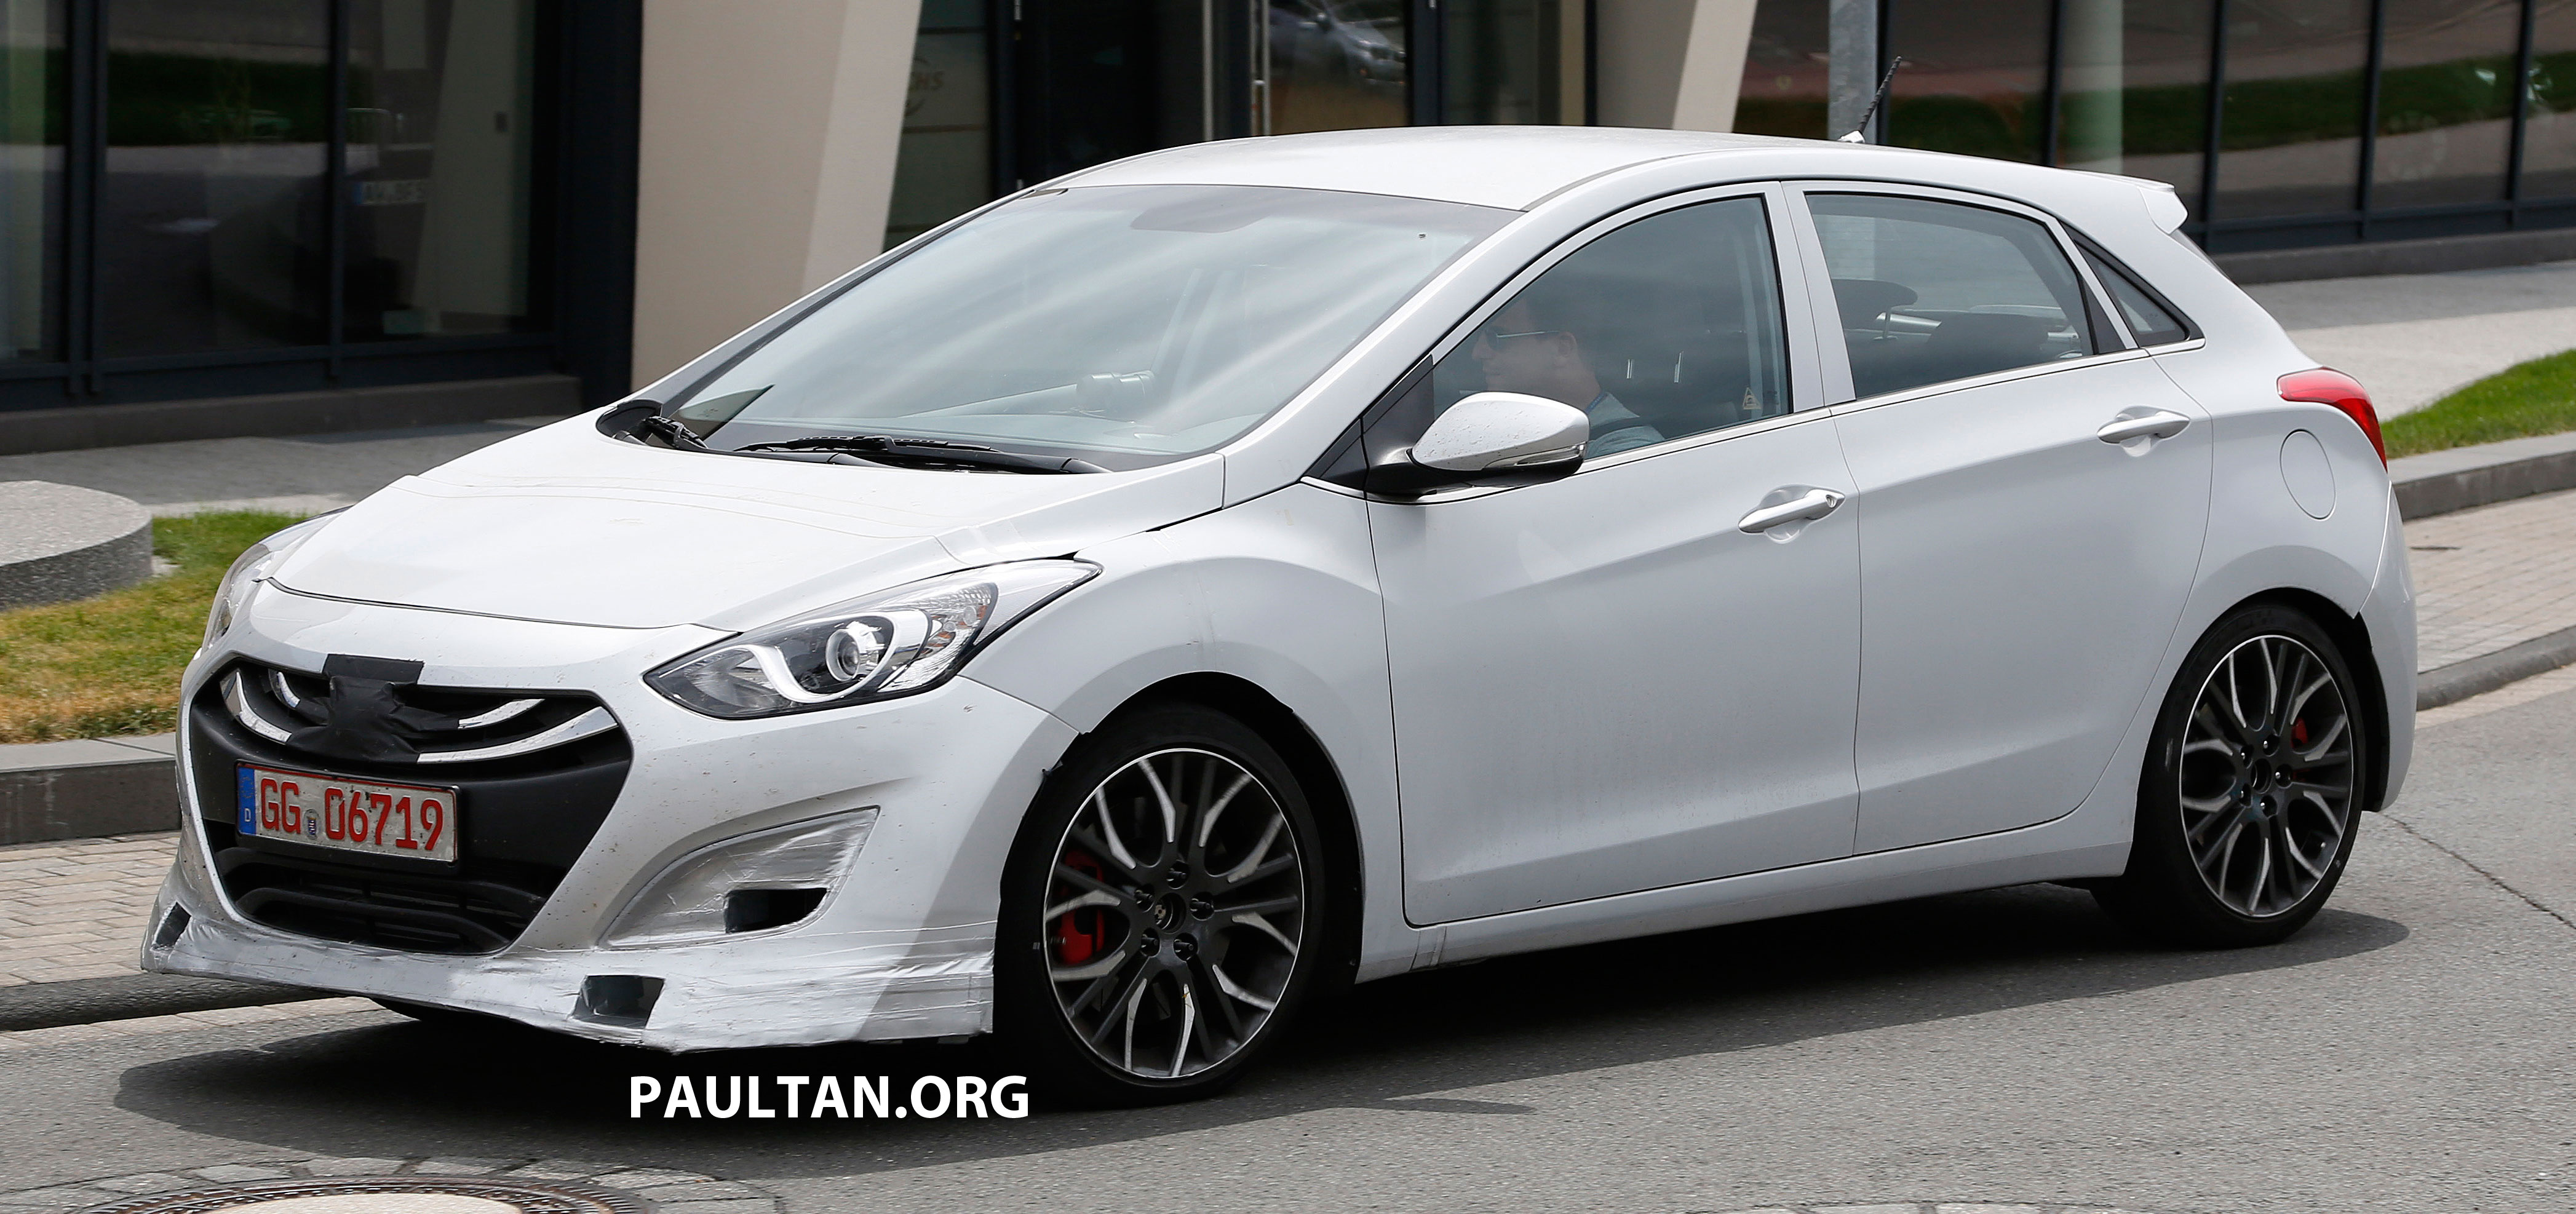 Hyundai I30n >> SPIED: Hardcore Hyundai i30 N to top 300 hp? Paul Tan - Image 358150